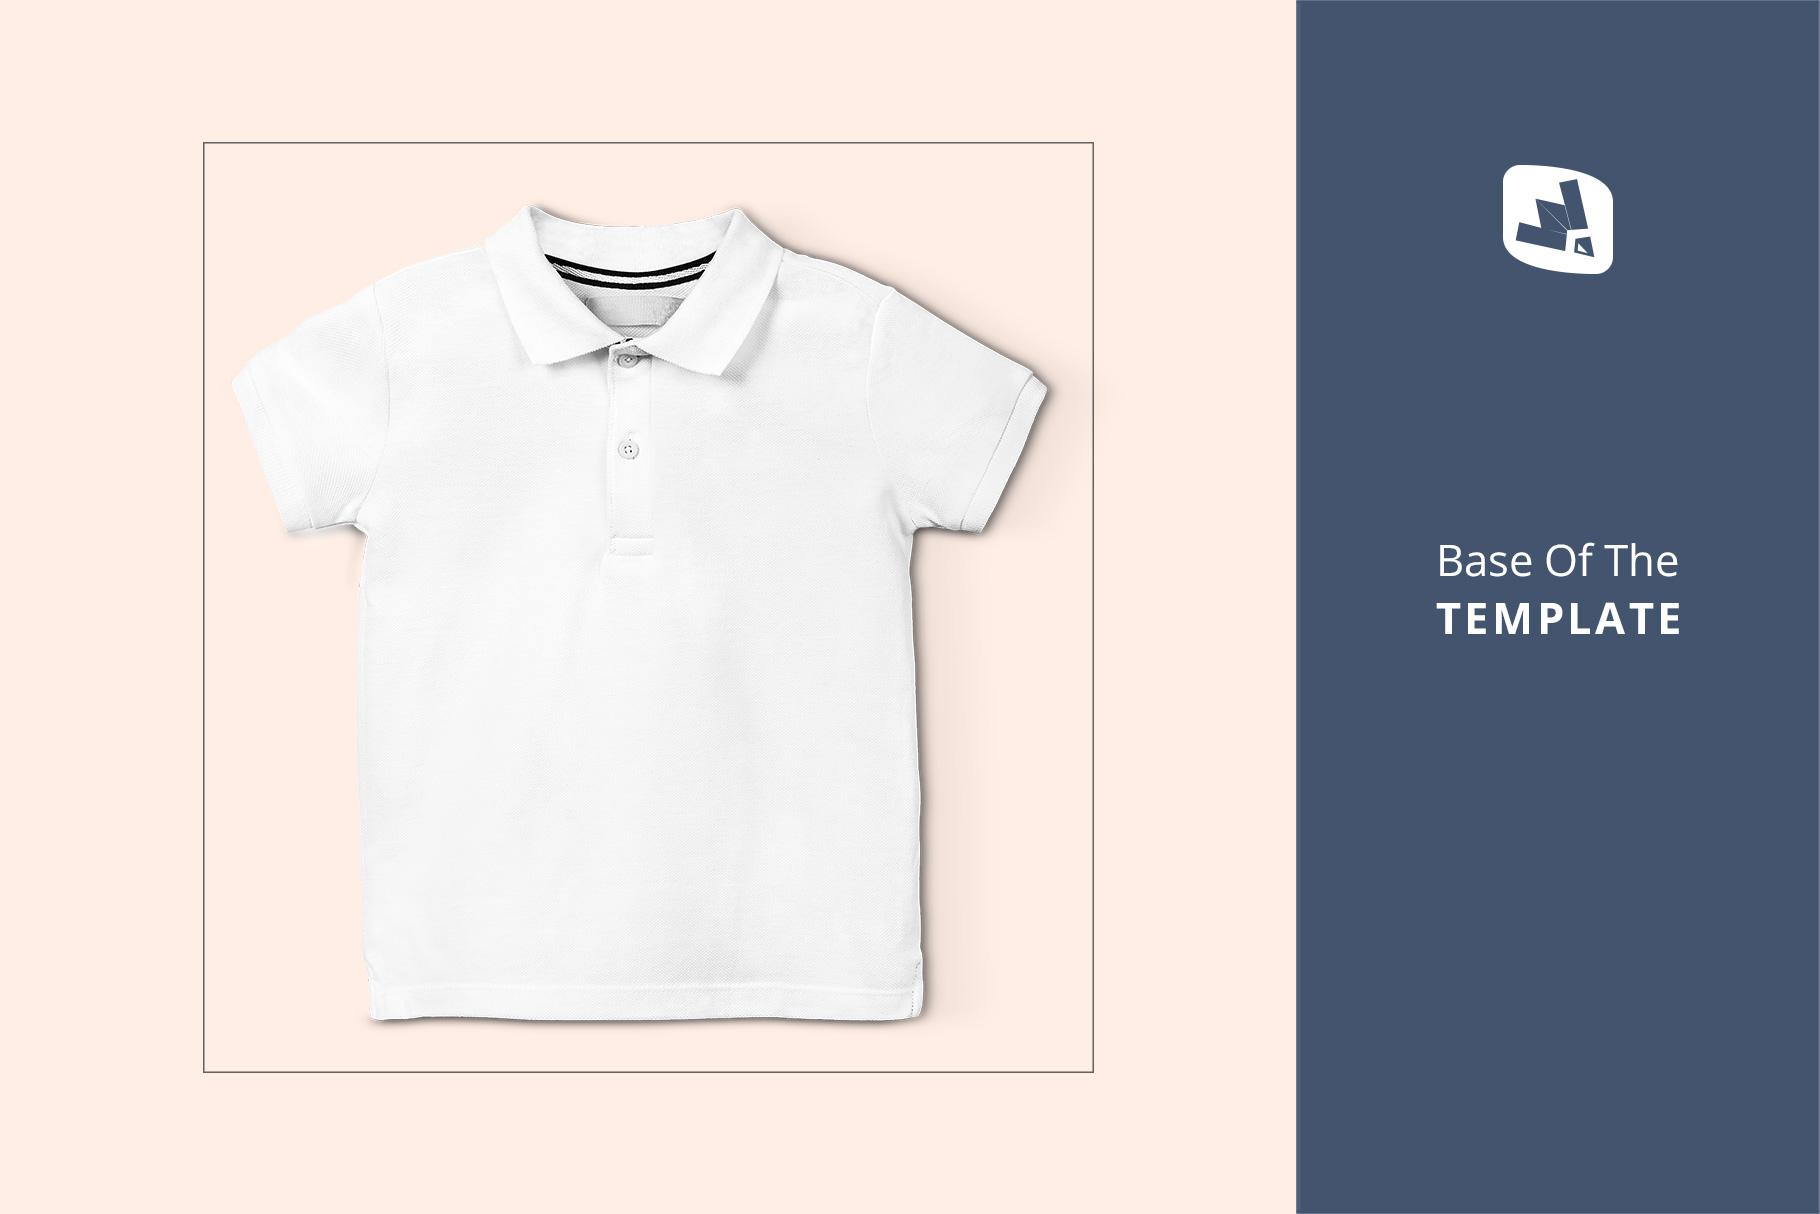 base image of the kid's half sleeve polo tshirt mockup